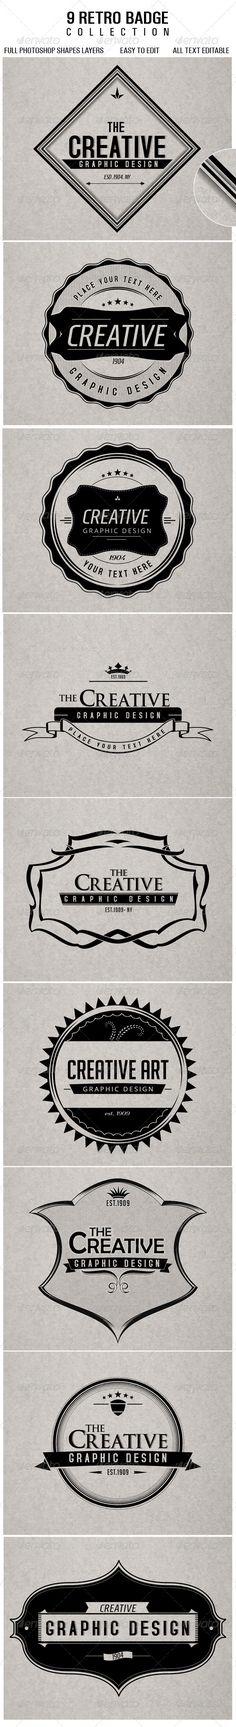 Retro Badges - GraphicRiver Item for Sale